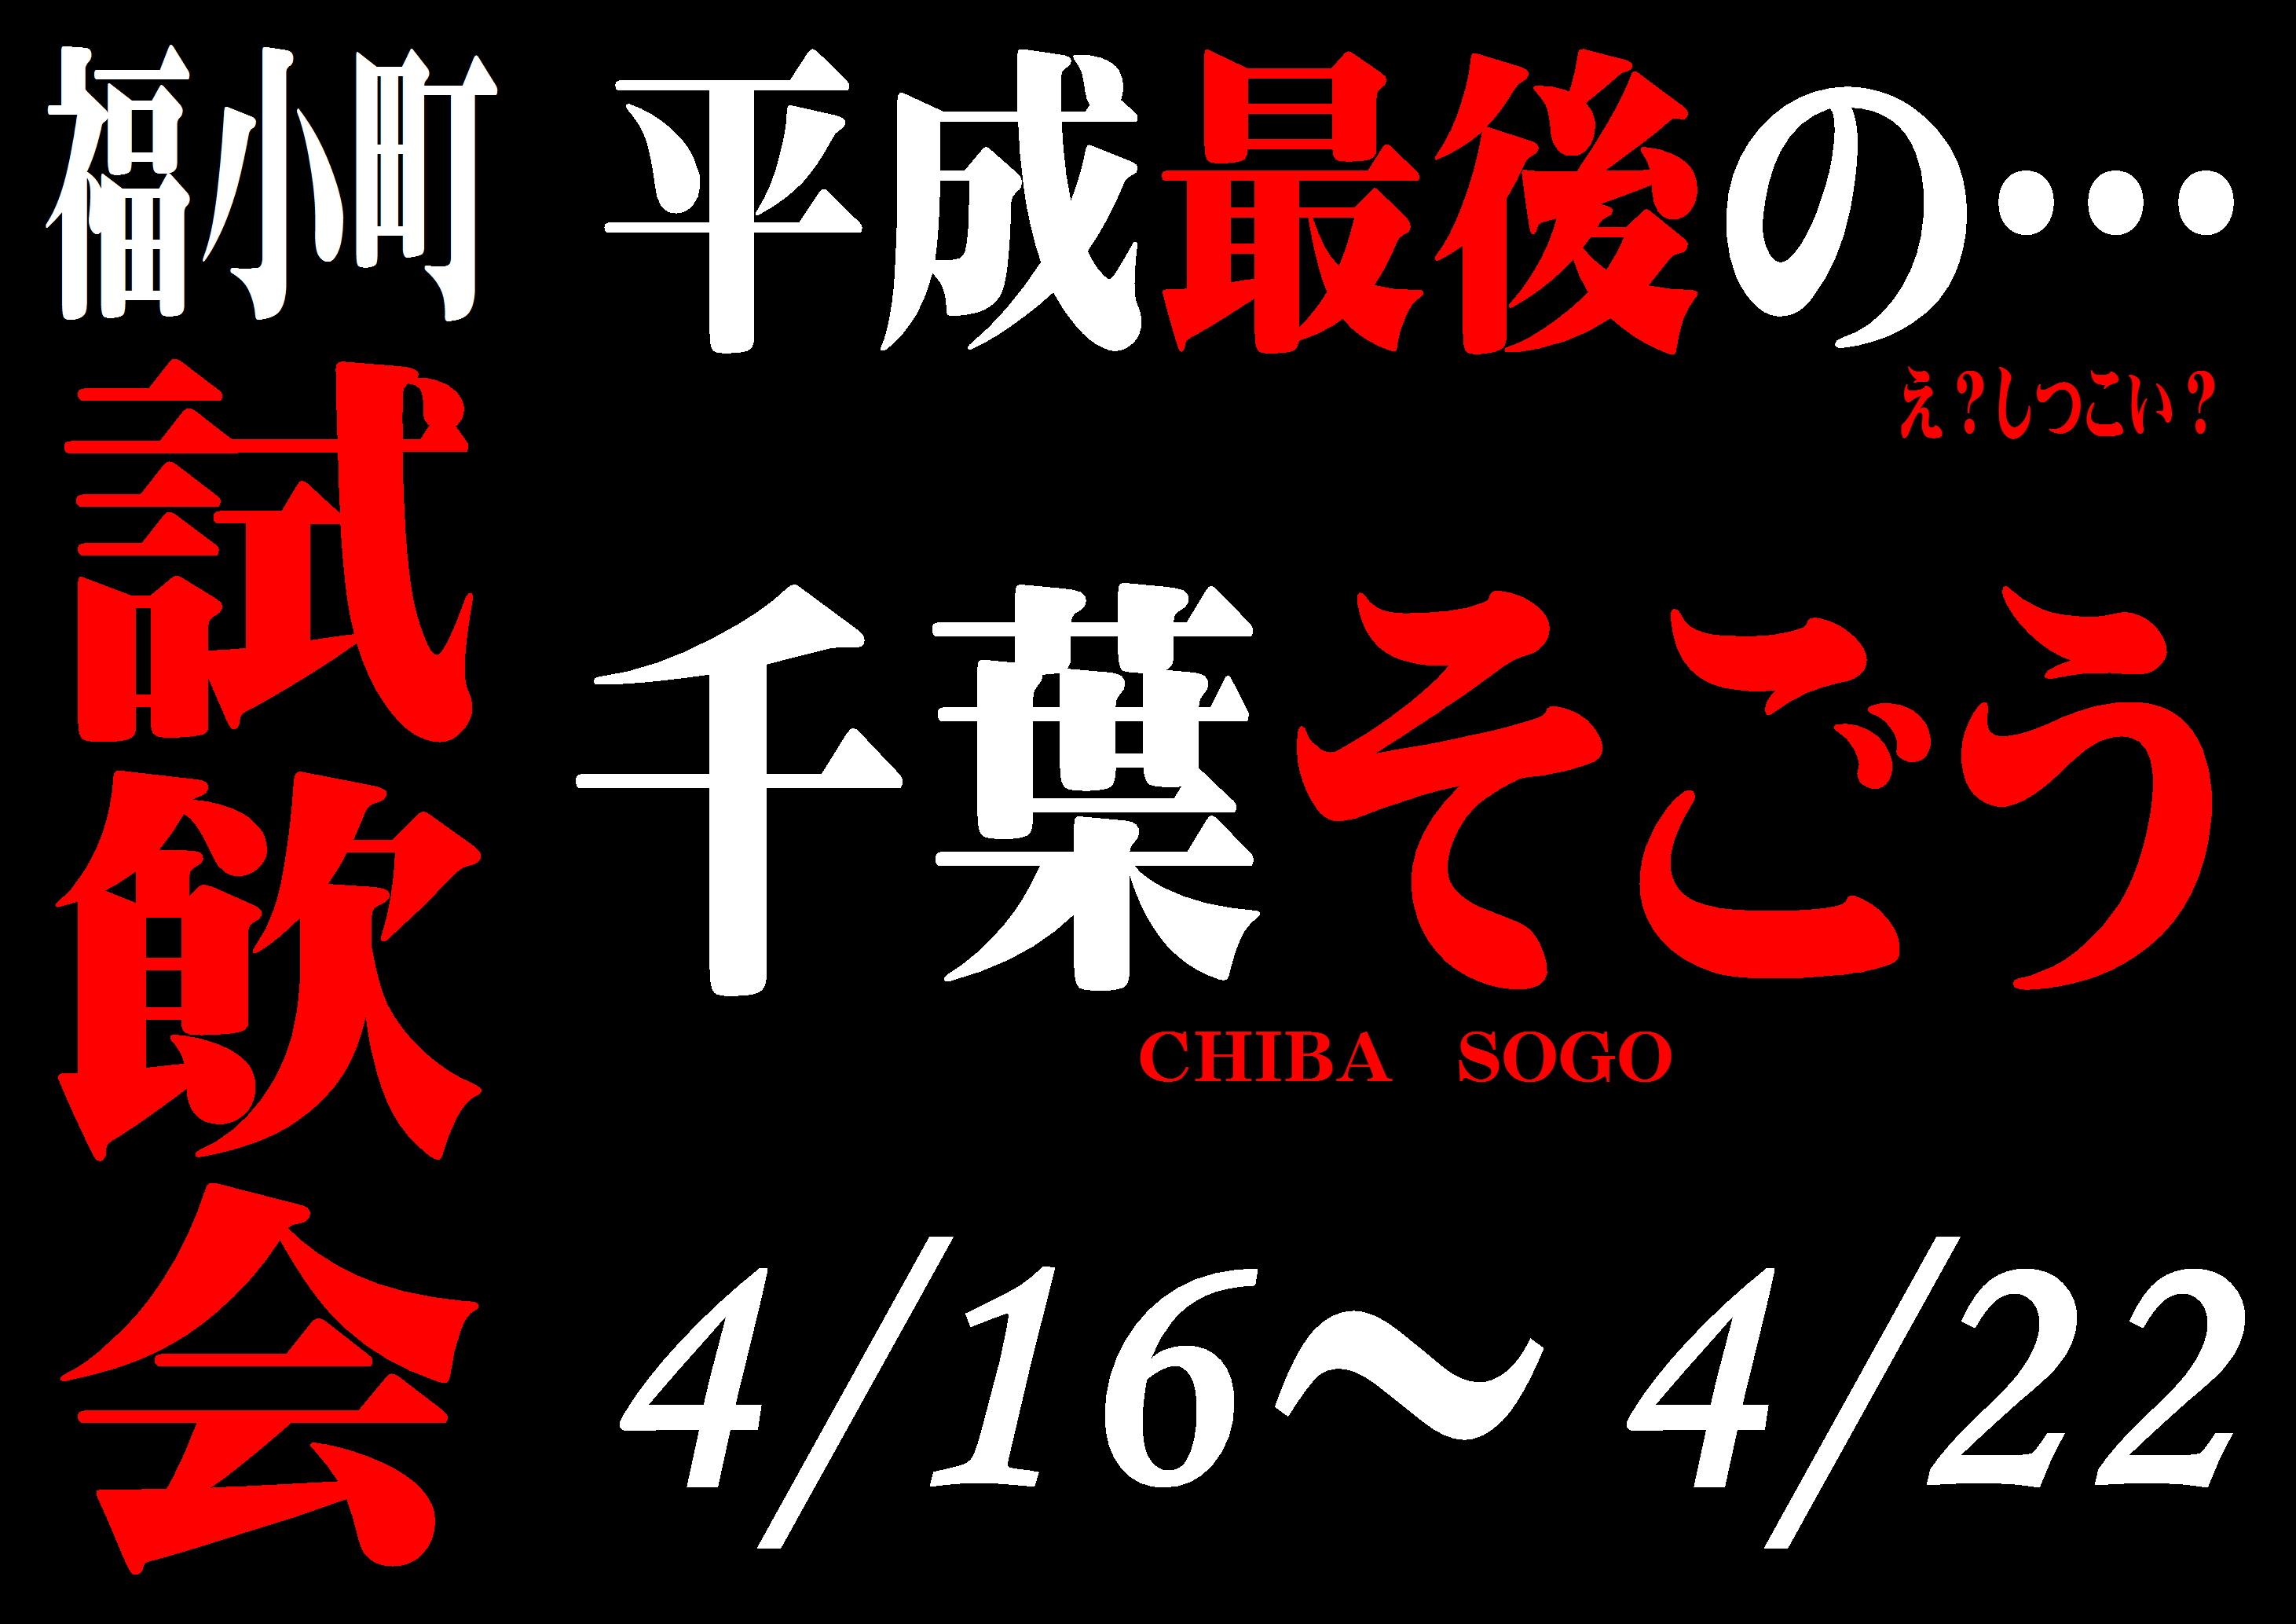 http://www.fukukomachi.com/blog/photo/20190417.JPG